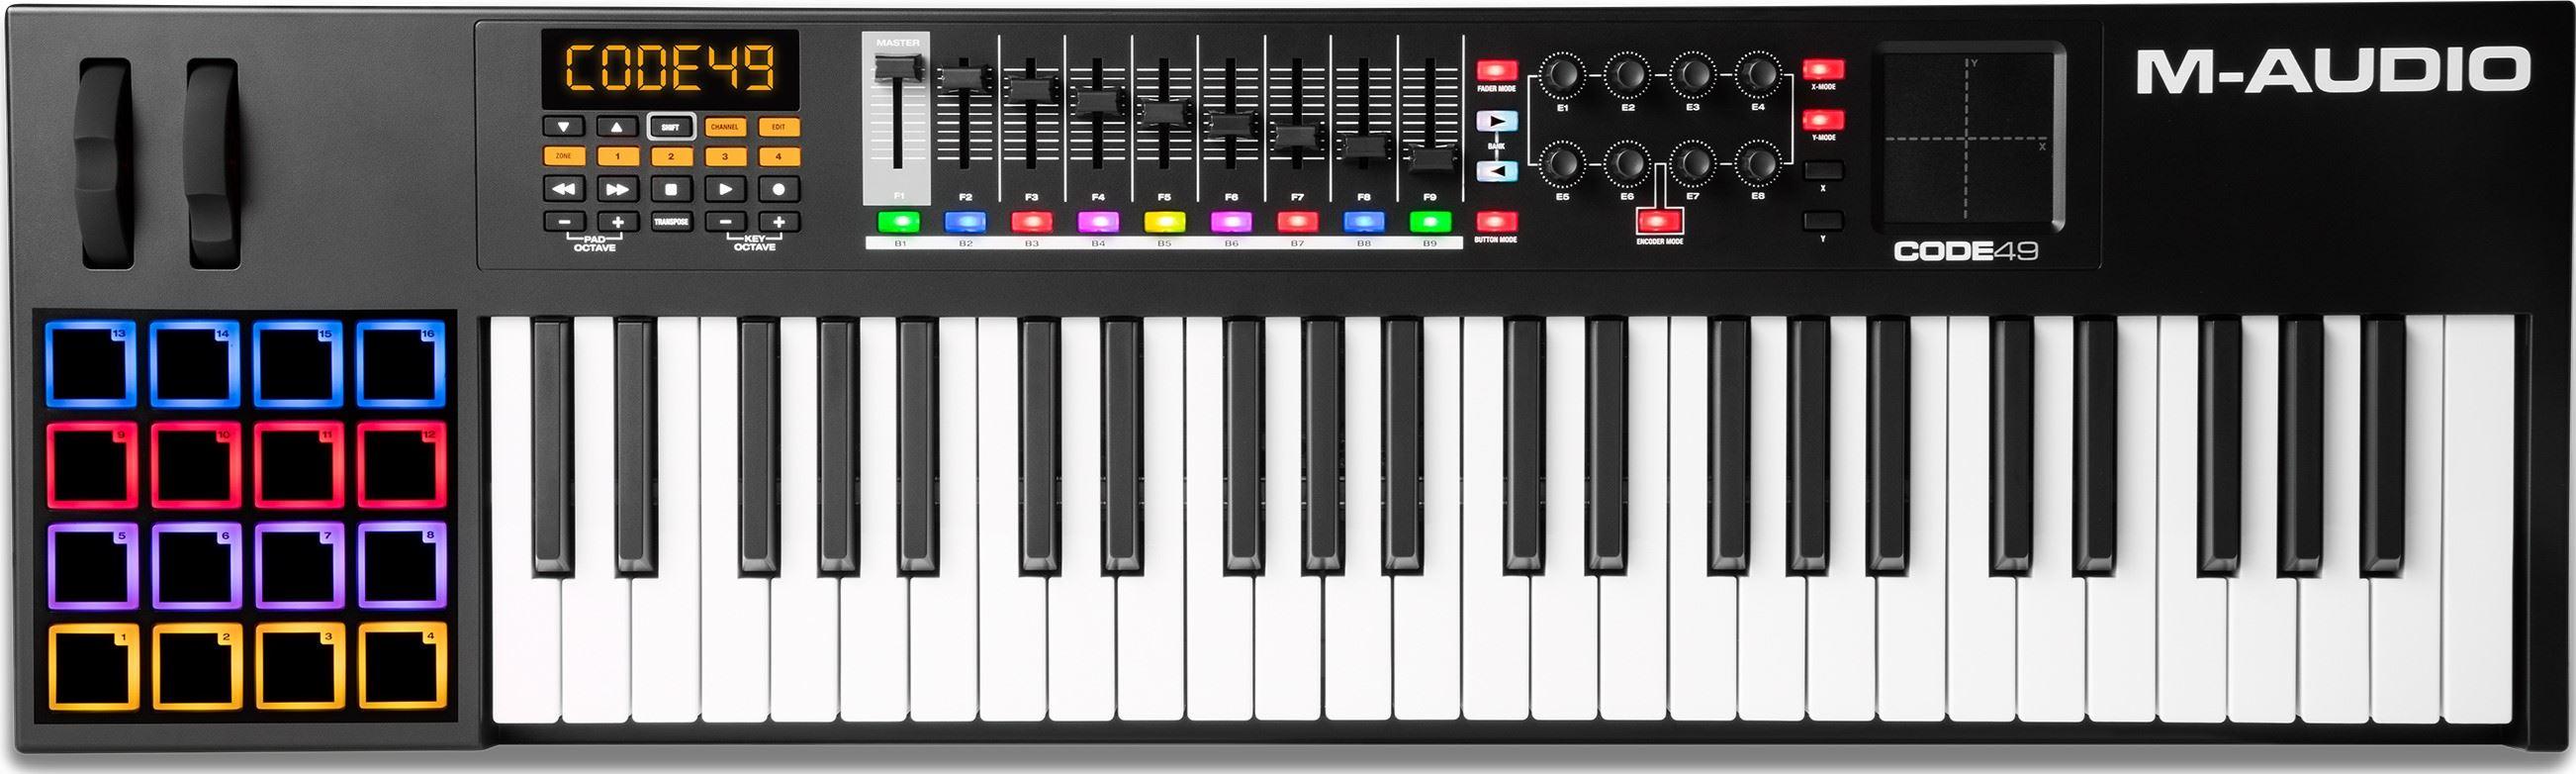 Kjøp M-Audio - Code 49 Black - USB MIDI Keyboard